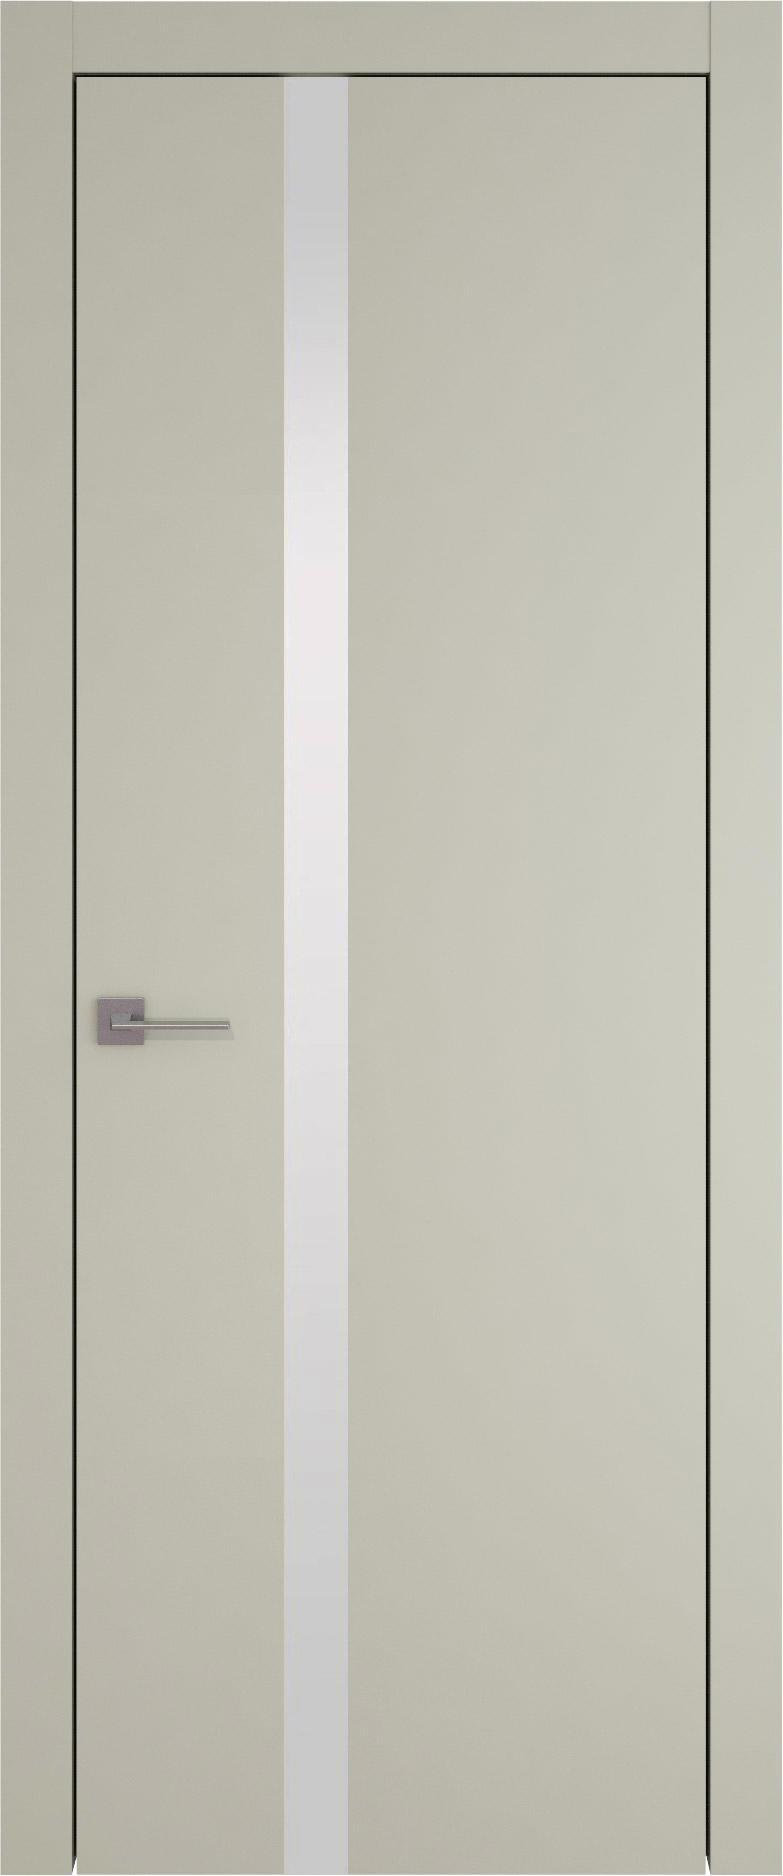 Tivoli Д-1 цвет - Серо-оливковая эмаль (RAL 7032) Без стекла (ДГ)